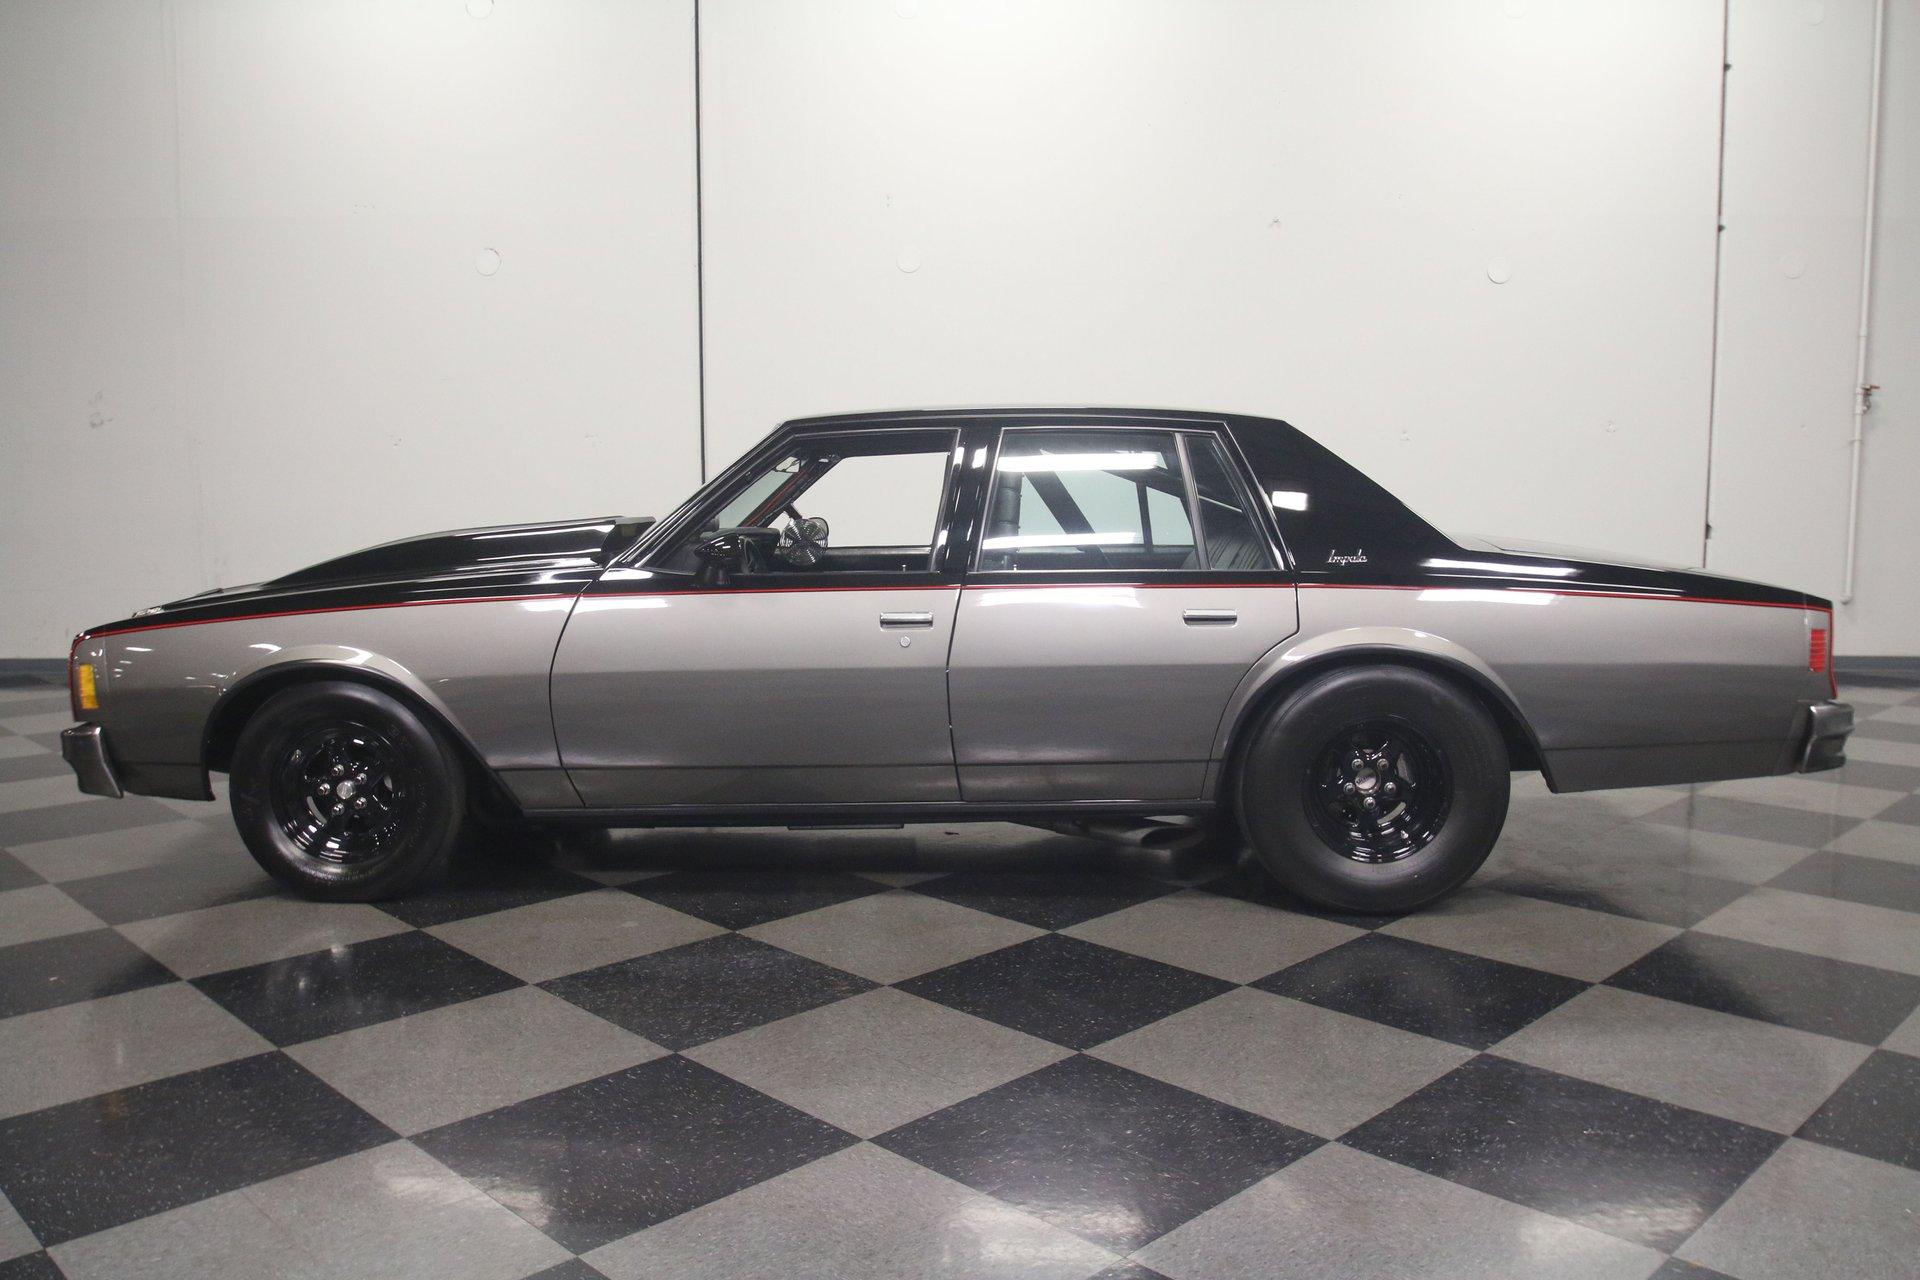 1979 chevrolet impala drag car